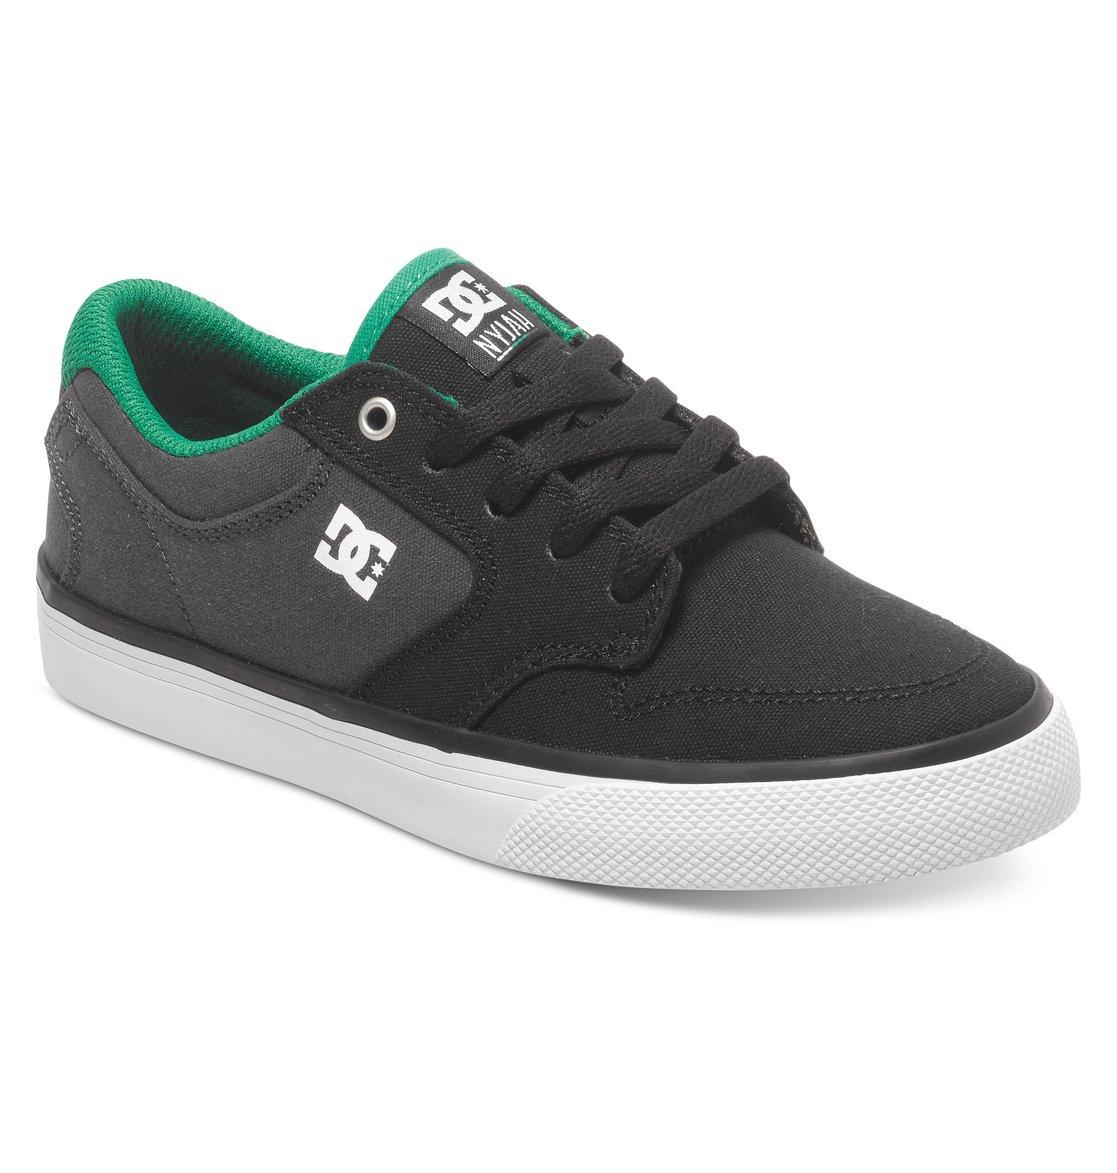 Dc Shoe Store Philippines